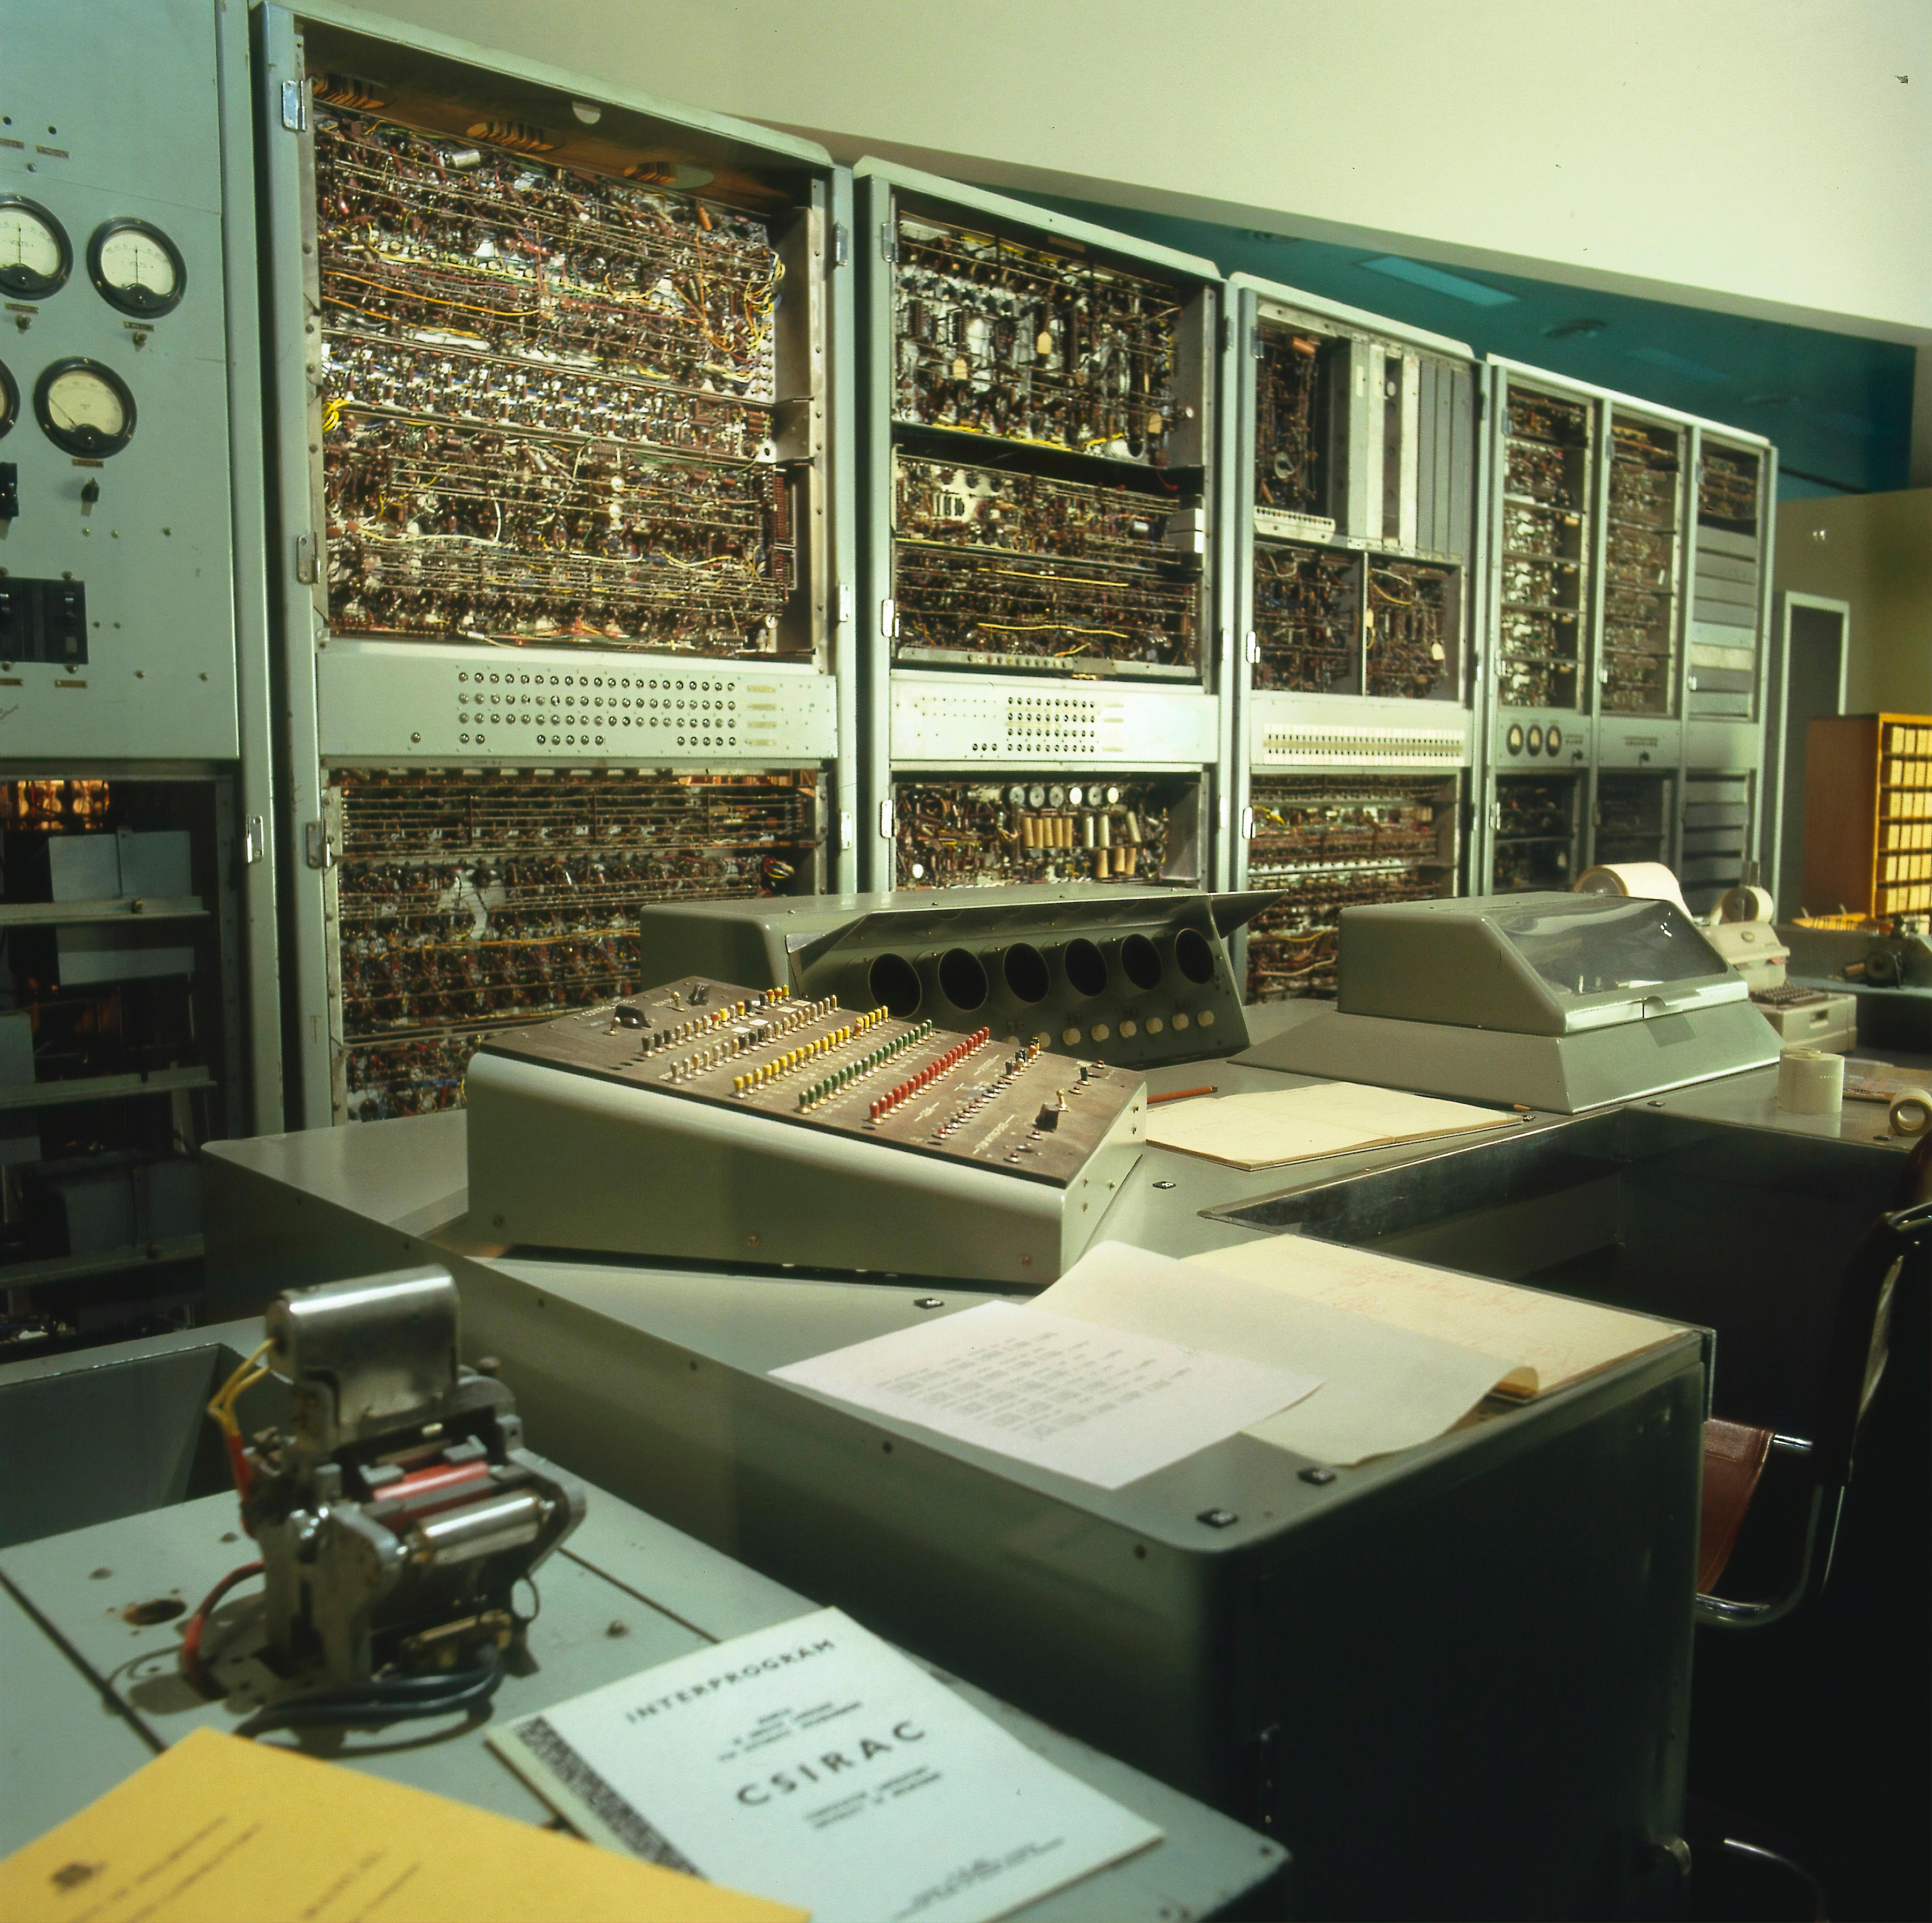 Alter Computer Raum